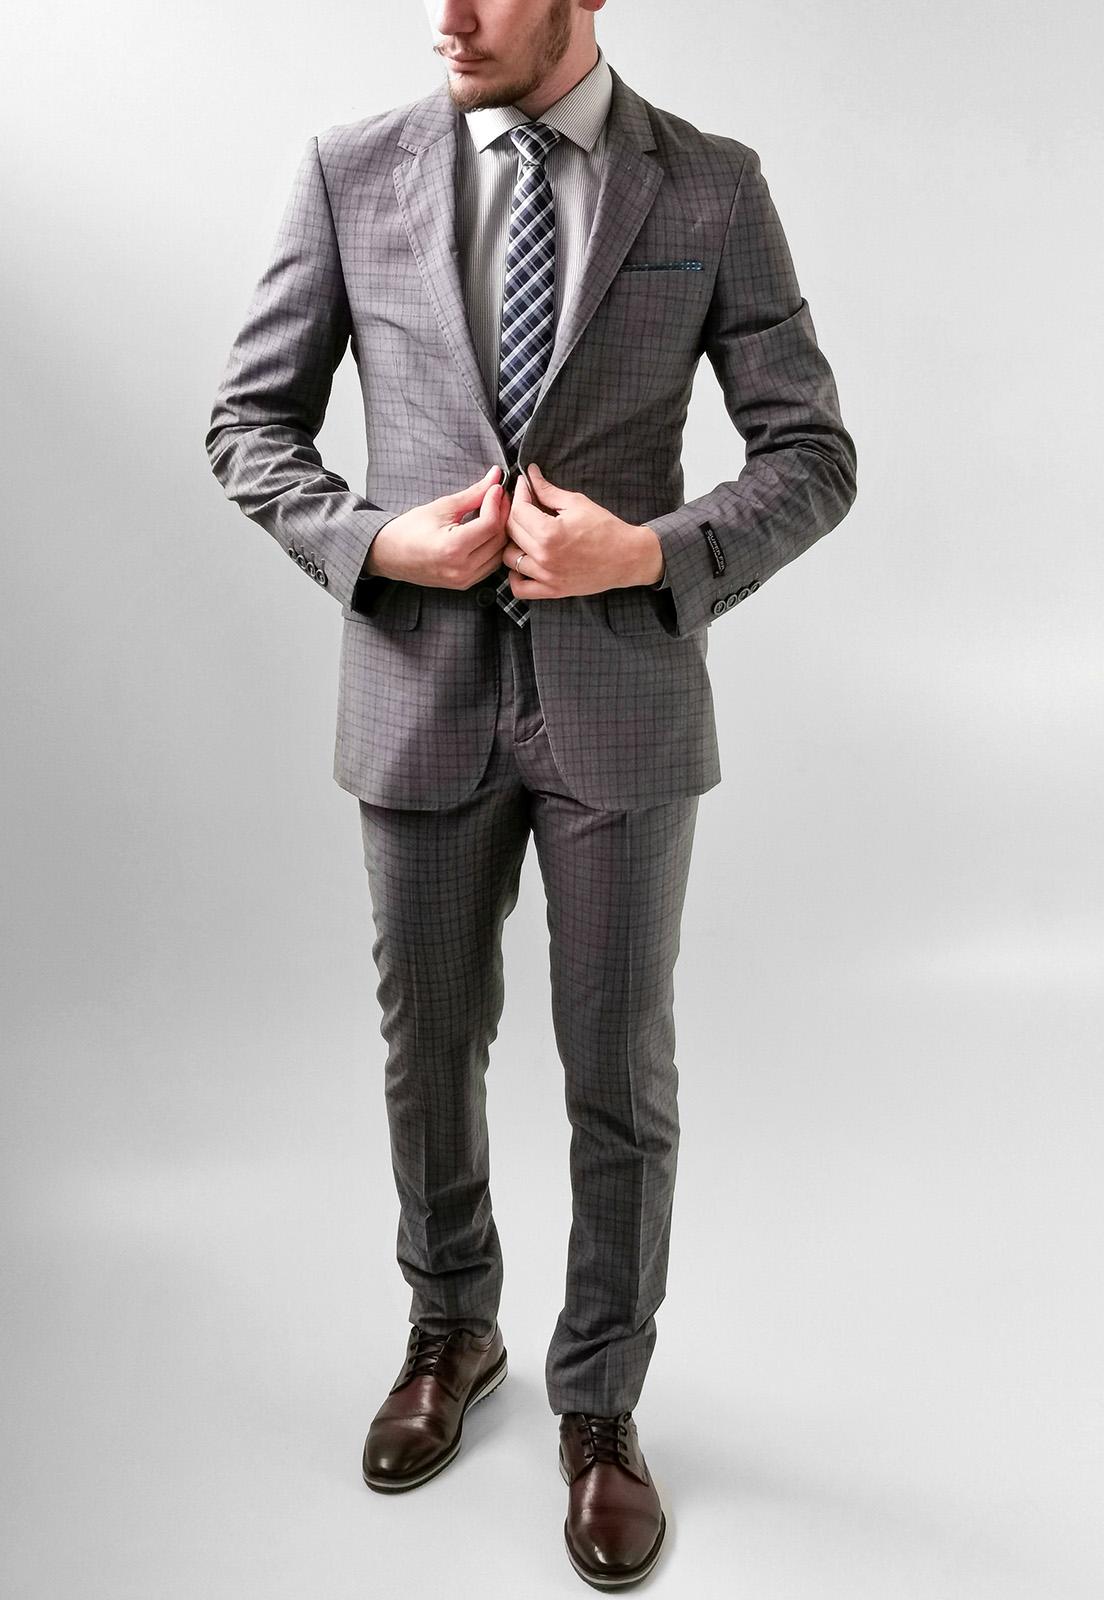 Terno Costume Super Slim Apa Xadrez Cinza